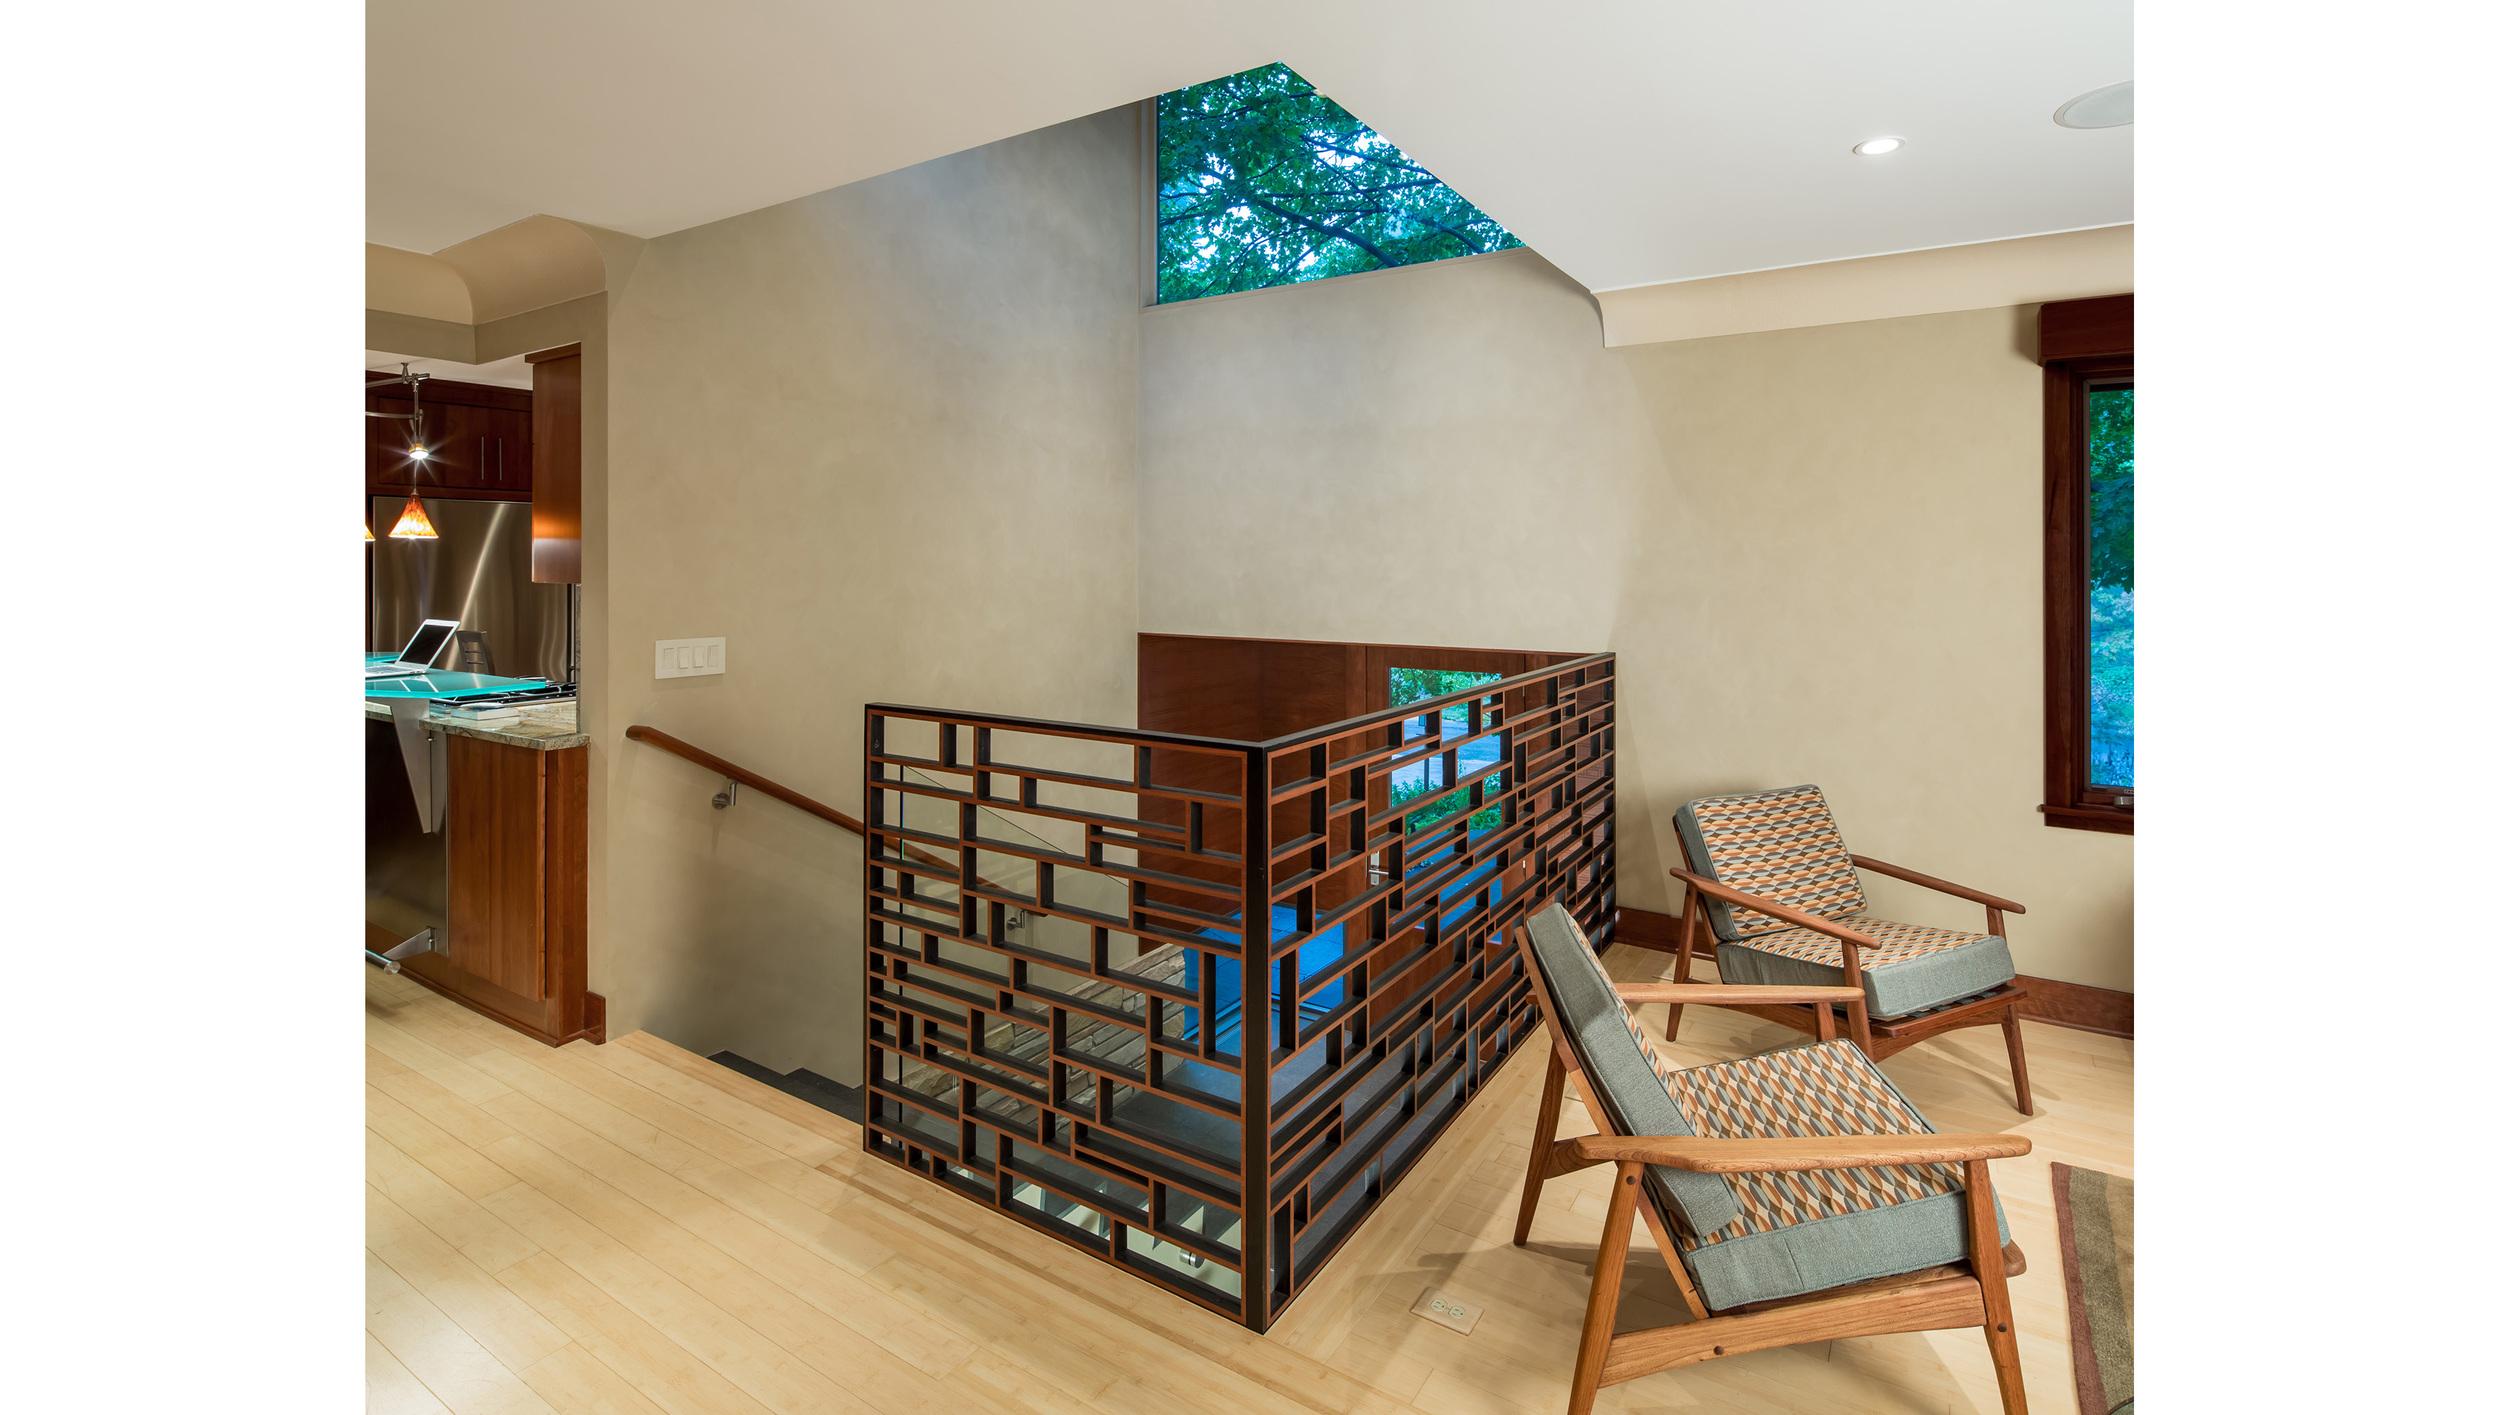 100 interior design for split level homes home design interior design for split level homes willow lane entry citydeskstudio